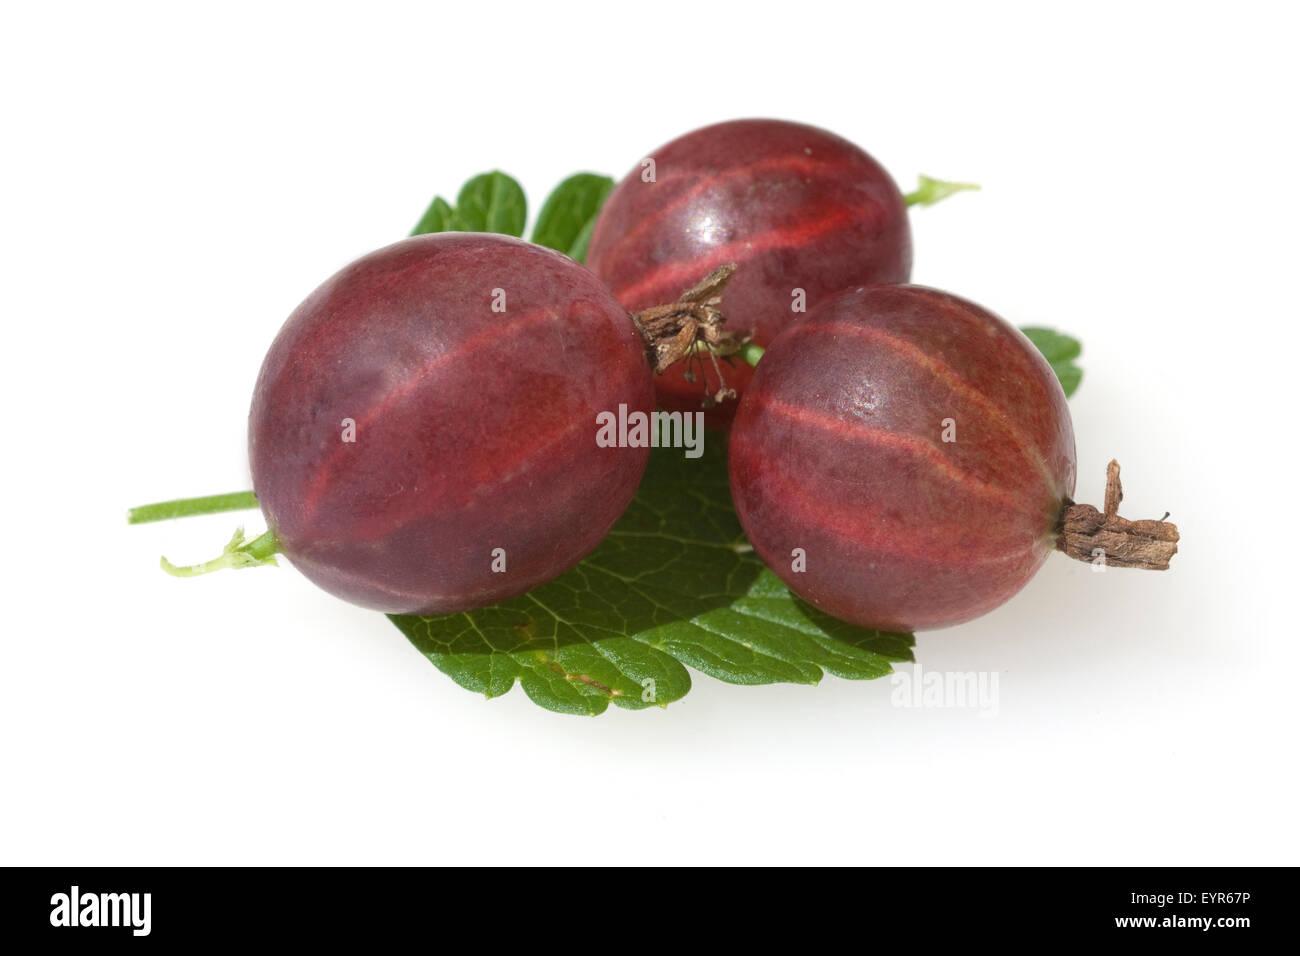 Stachelbeere; Ribes; uva-crispa; Strauch; Wildpflanzen; - Stock Image